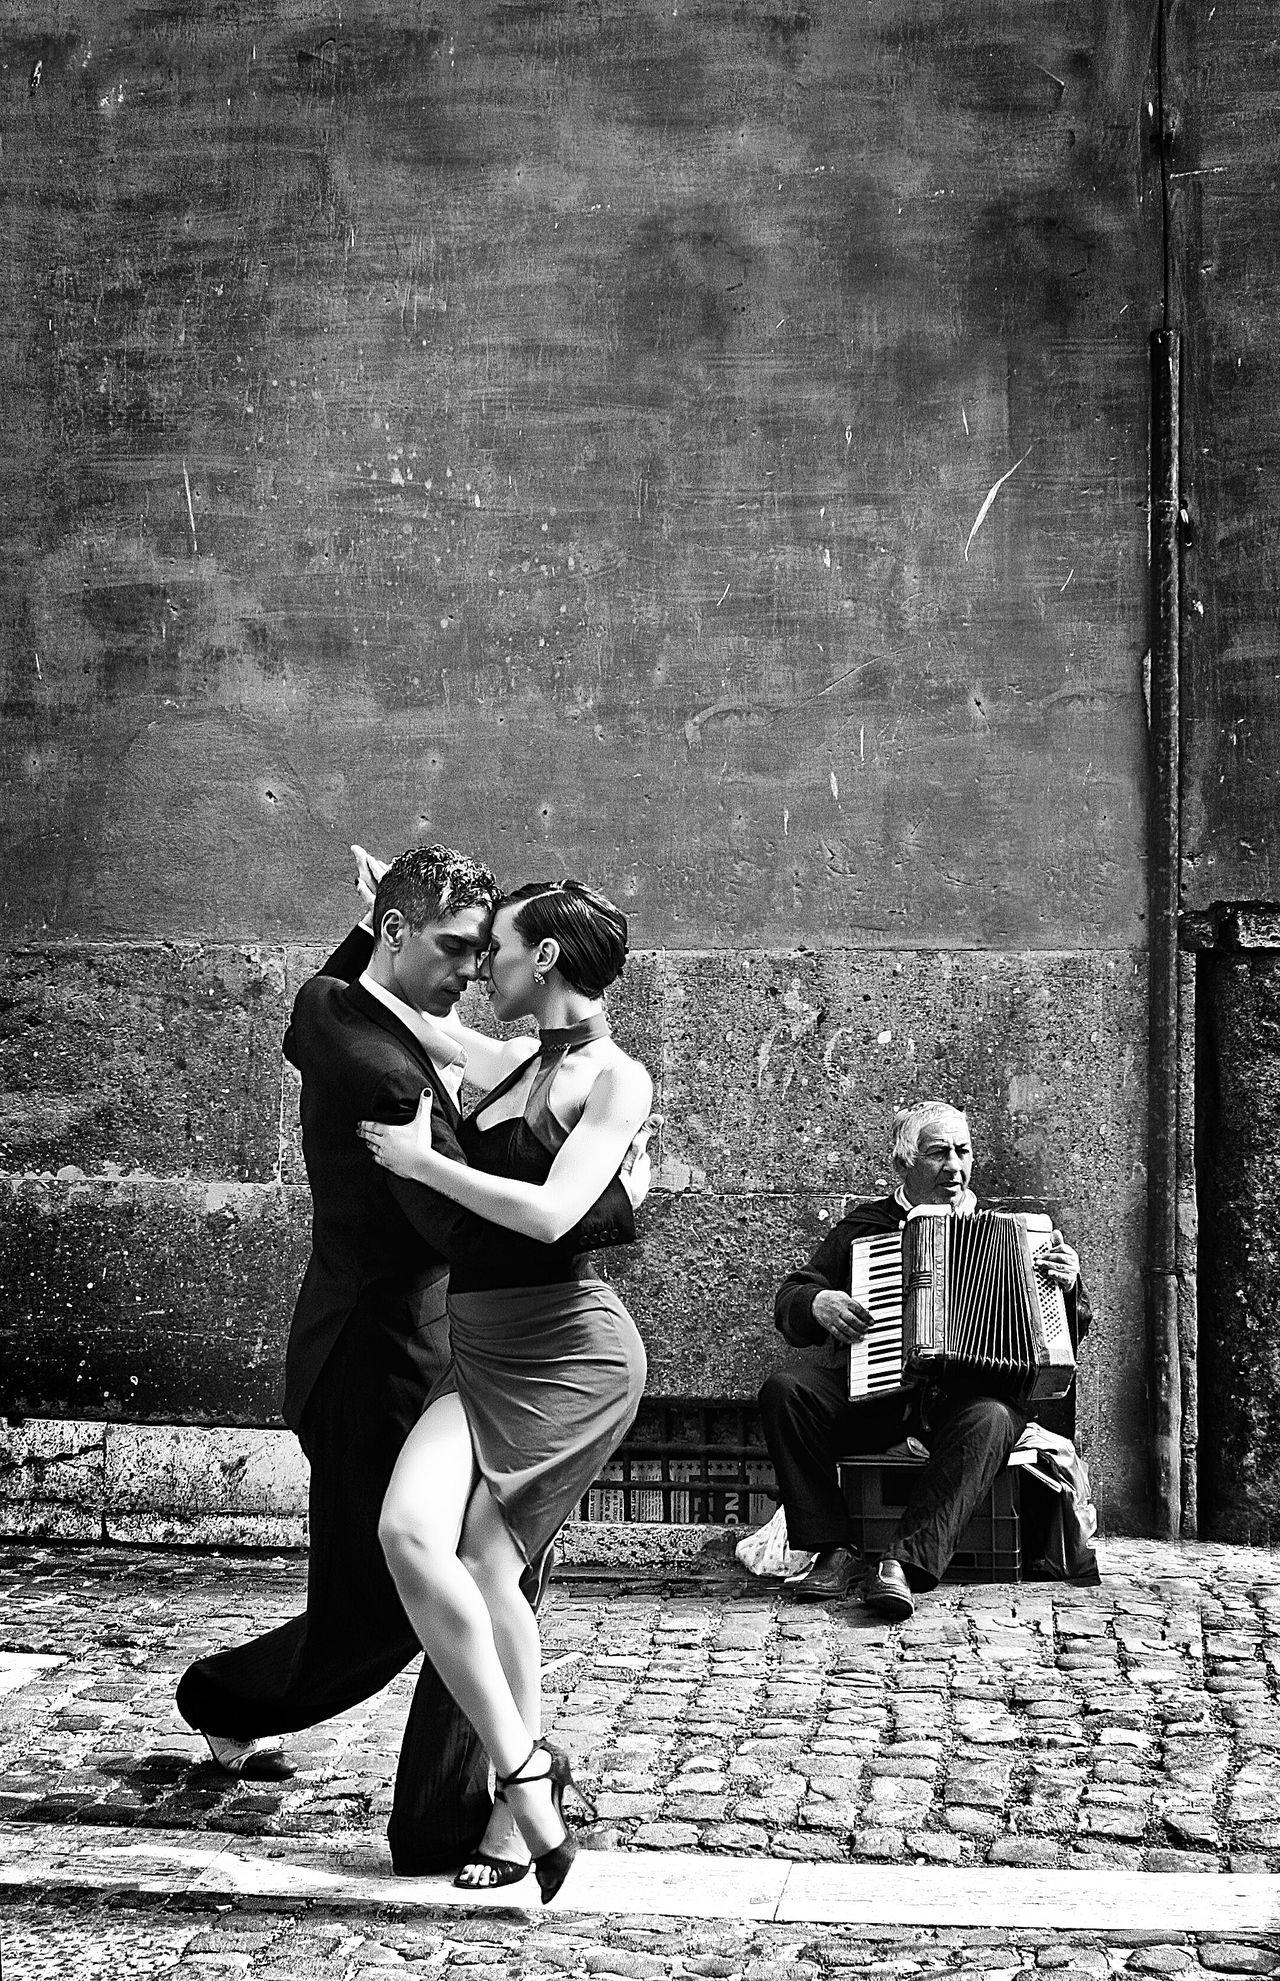 Black&white Blackandwhite Blackandwhite Photography Black And White Black & White Dance Photography Dance Tango Life Tango Street Photography